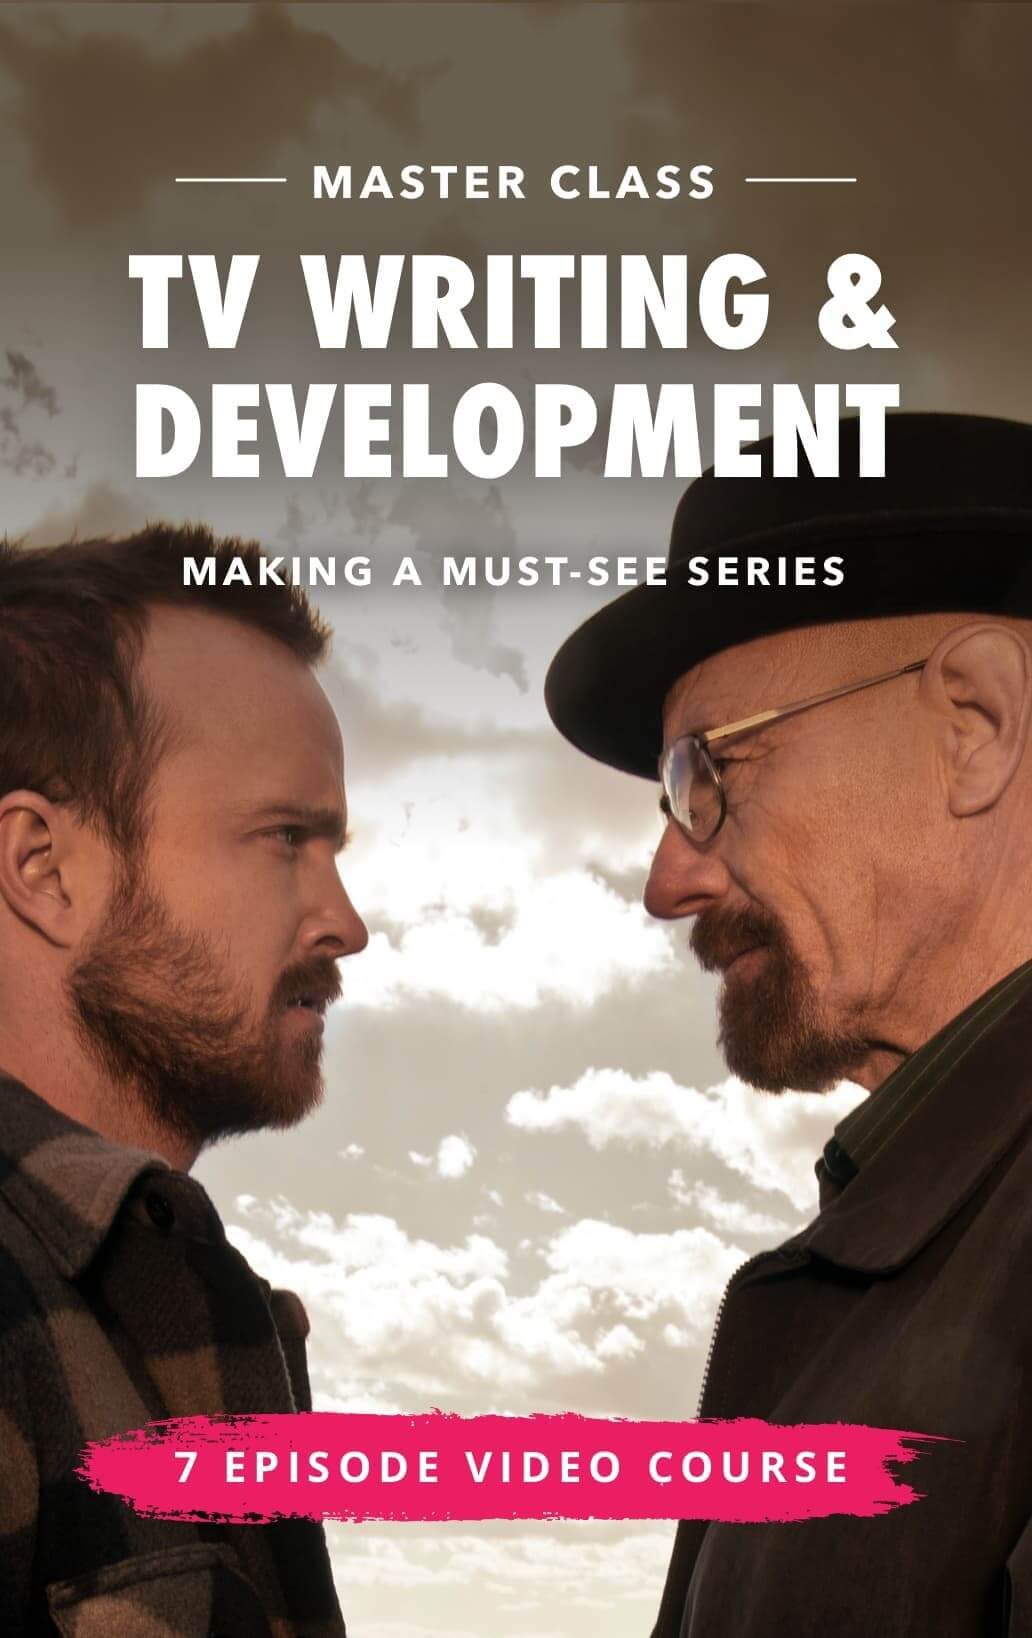 Screenwriting E-Course - TV Writing and Development - StudioBinder